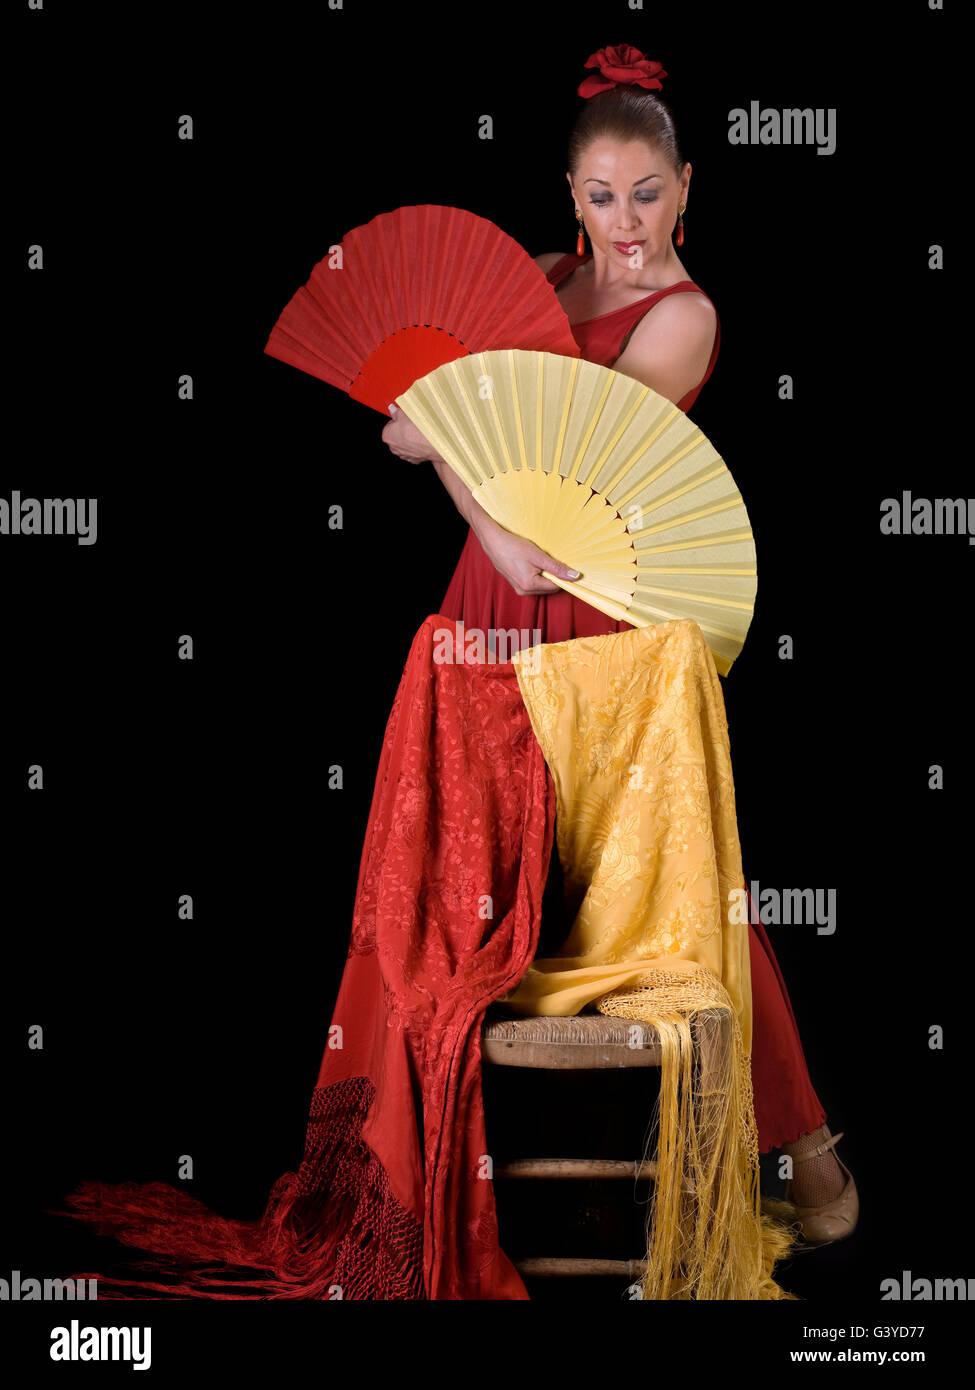 Spanish Woman, flamenco dancing, looking at the camera - Stock Image